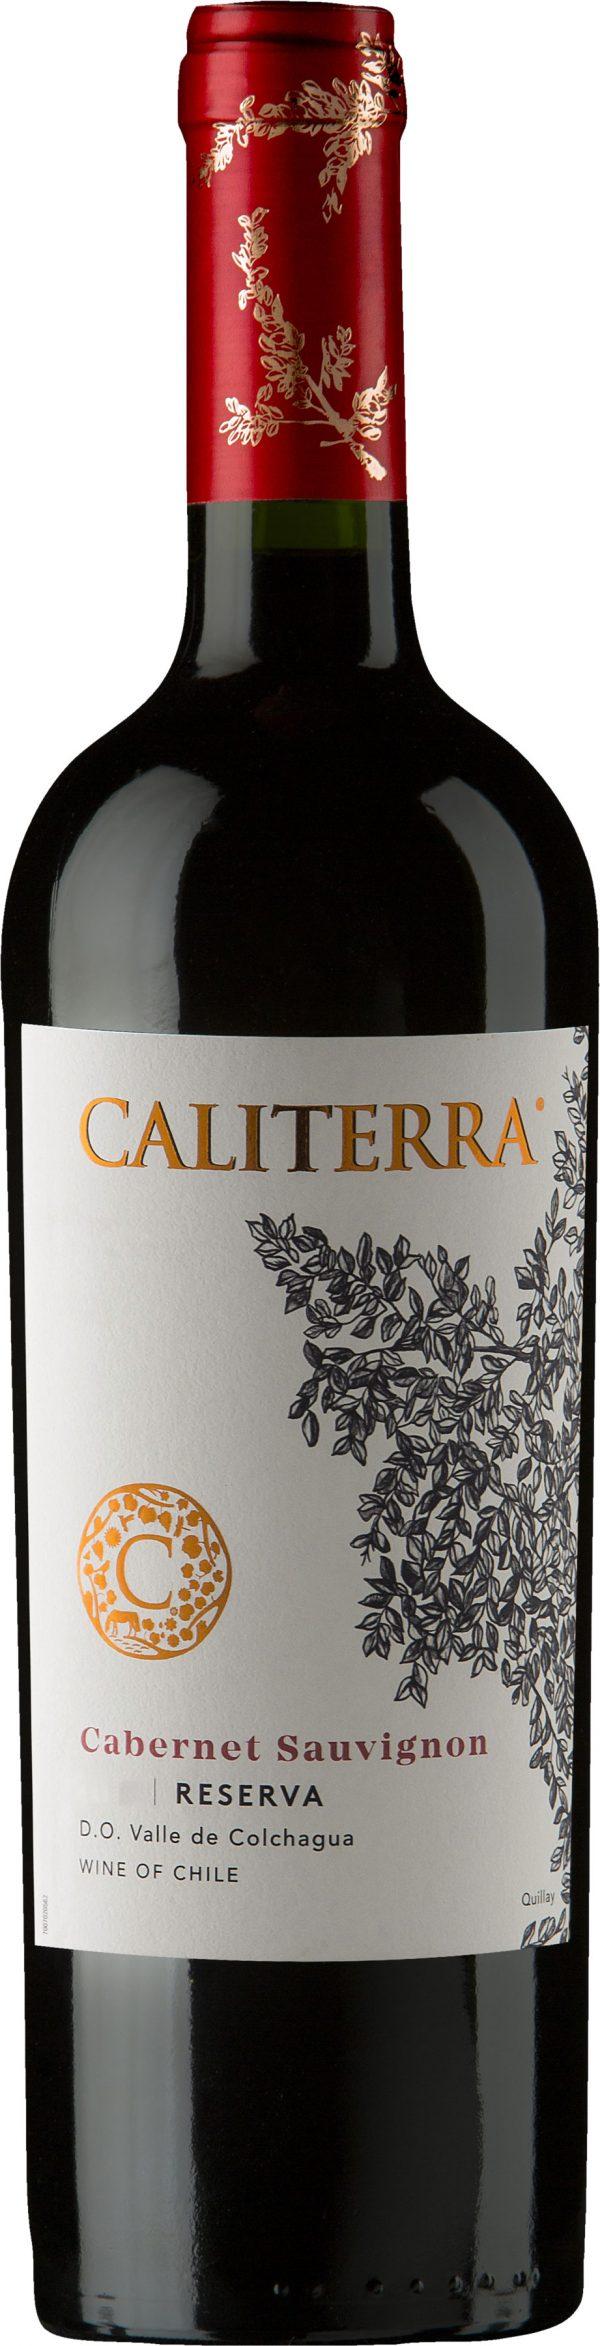 Caliterra - Reserva Cabernet Sauvignon 2017 75cl Bottle